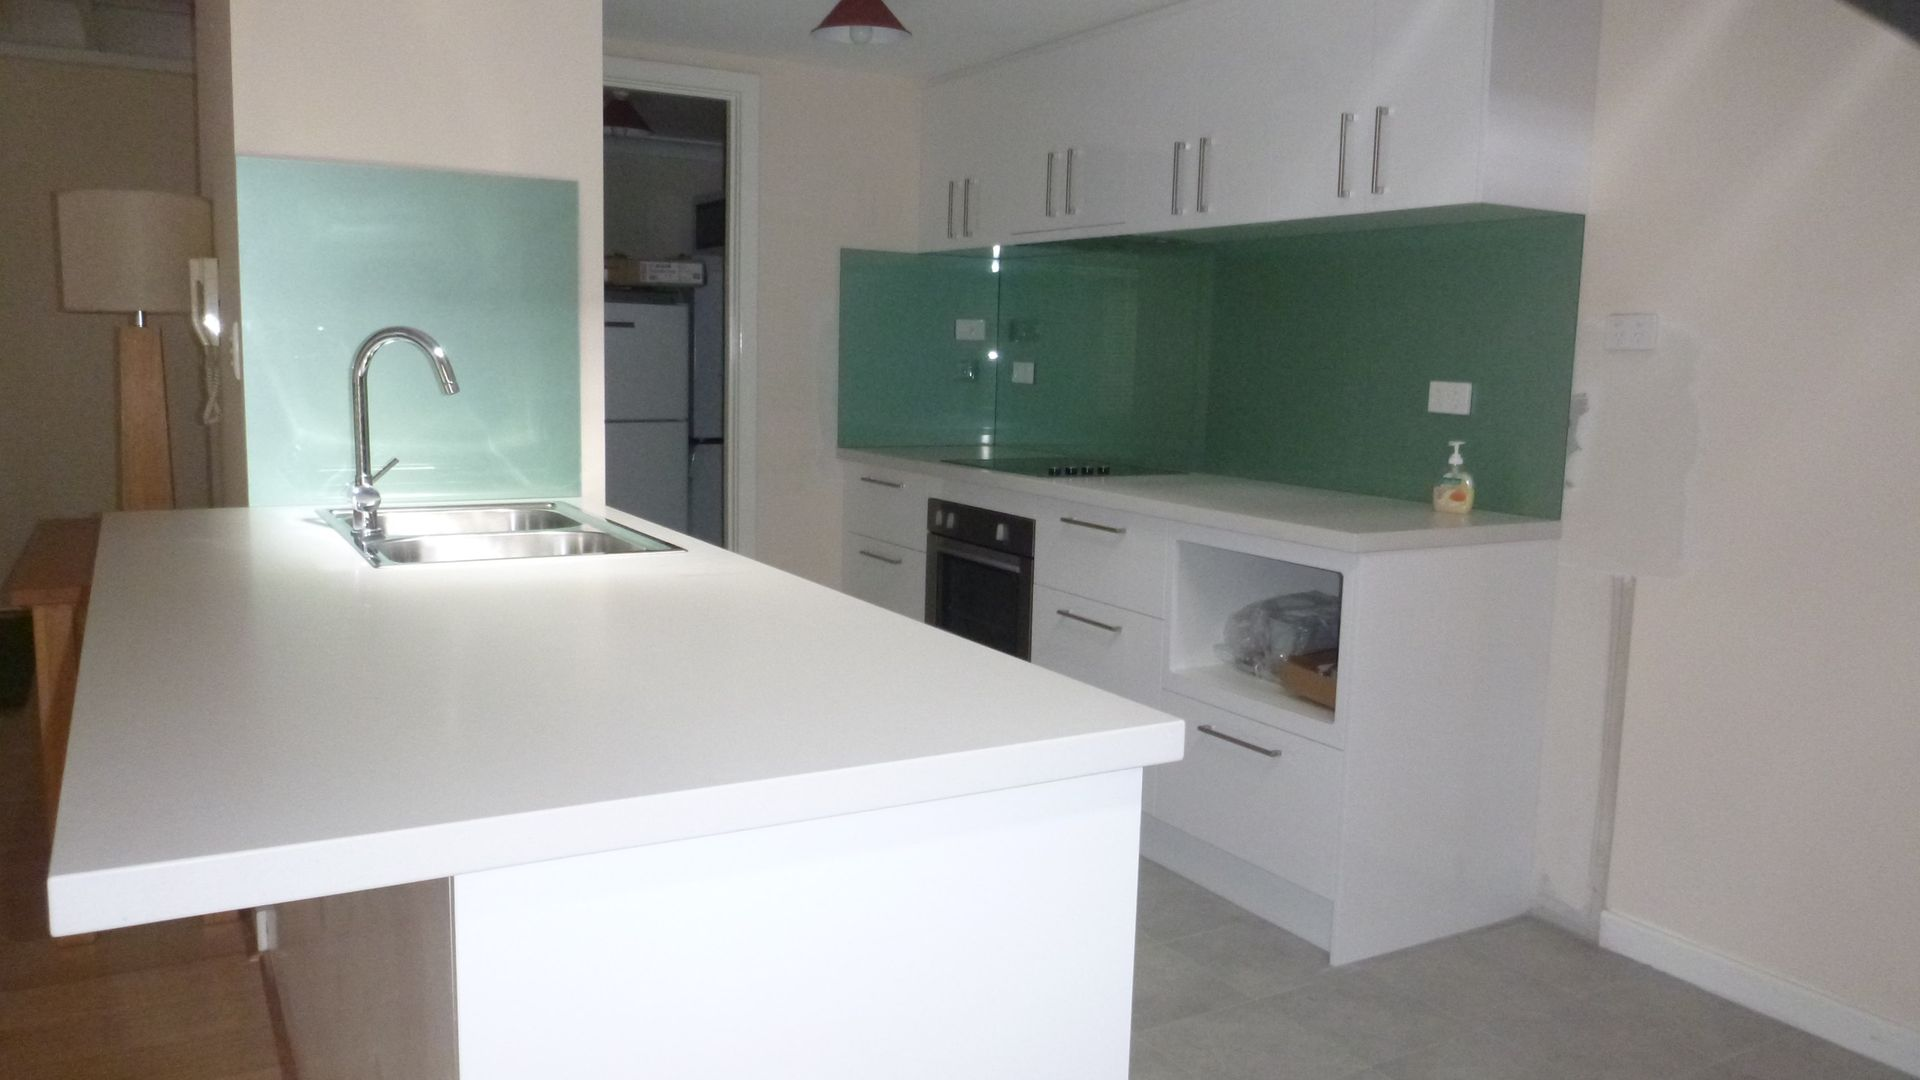 16/13-15 Cantonment Street, Fremantle WA 6160, Image 1